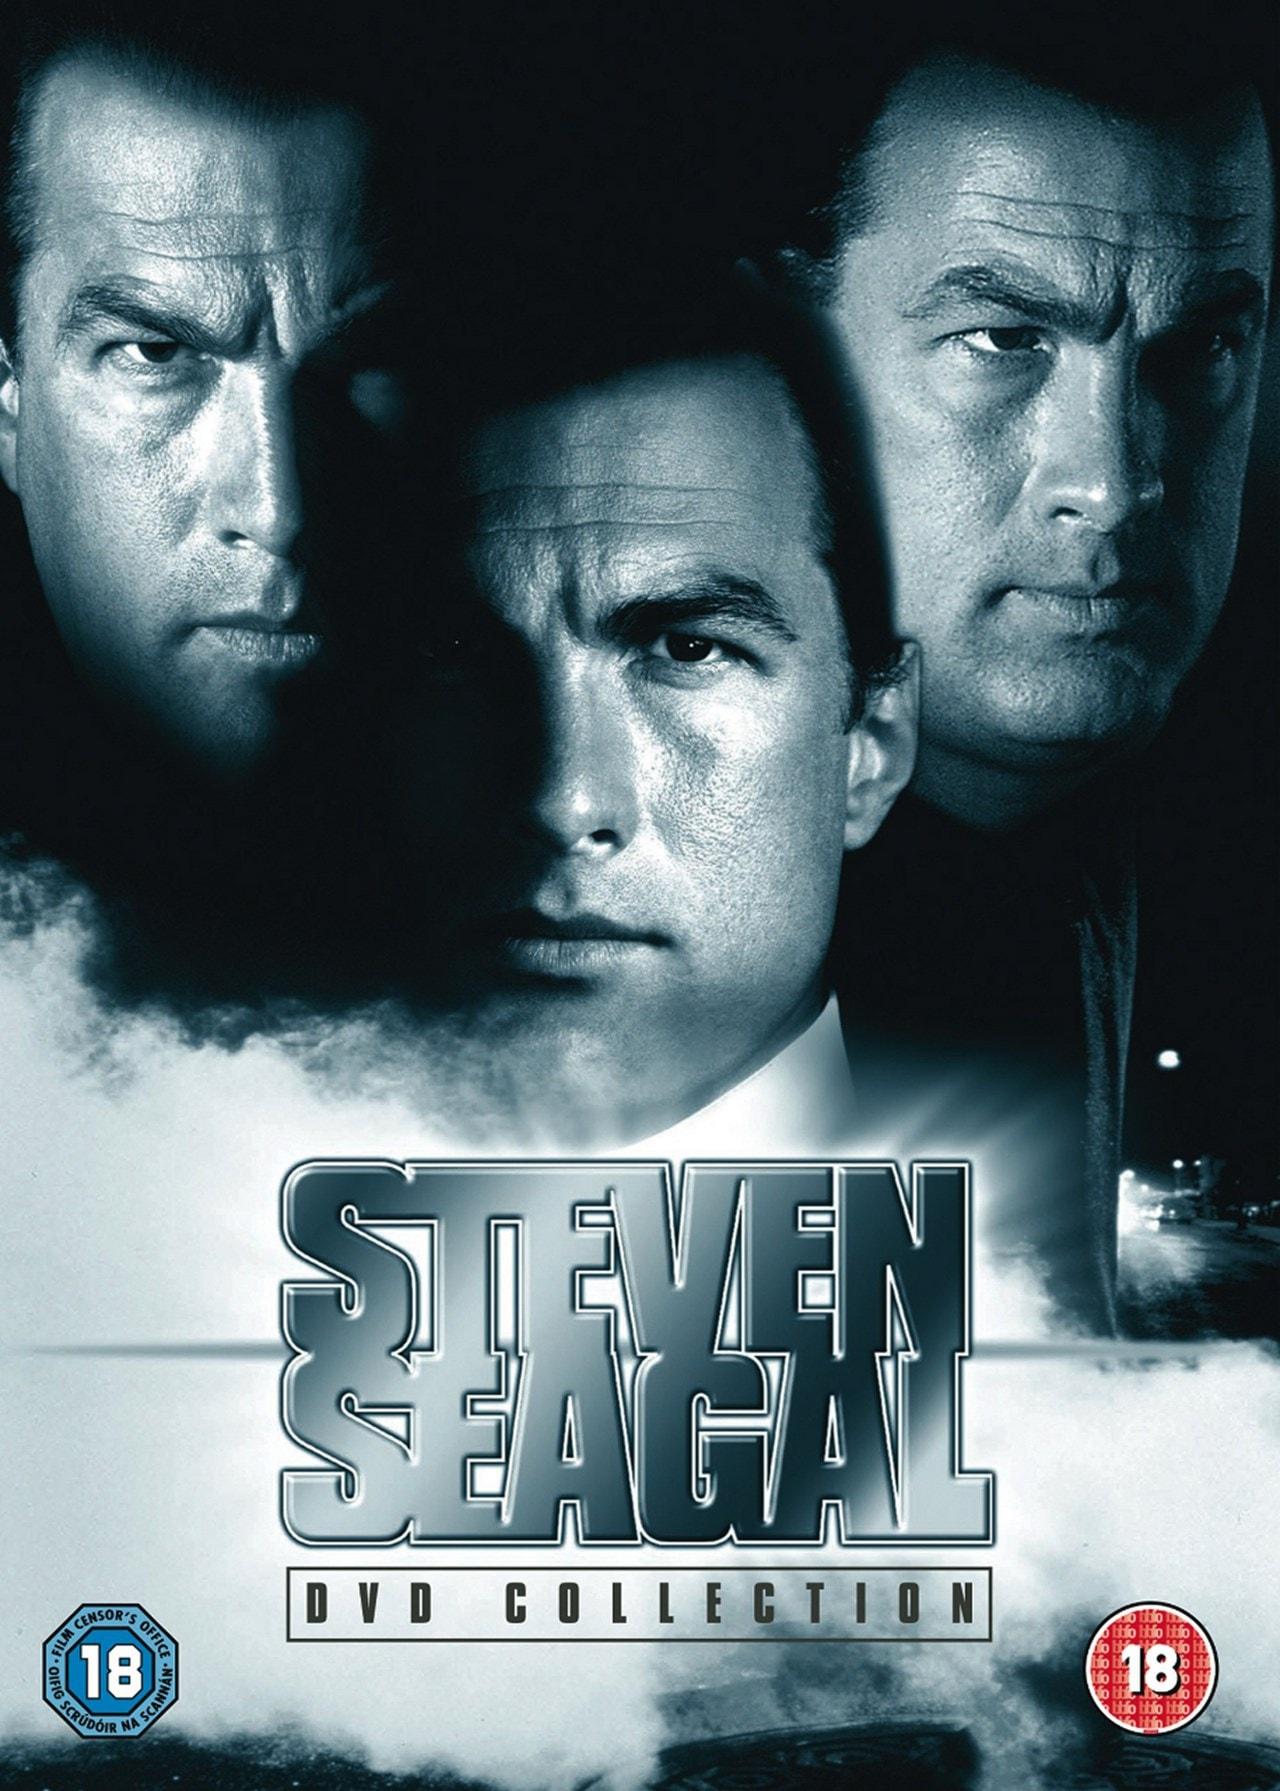 The Steven Seagal Legacy - 1